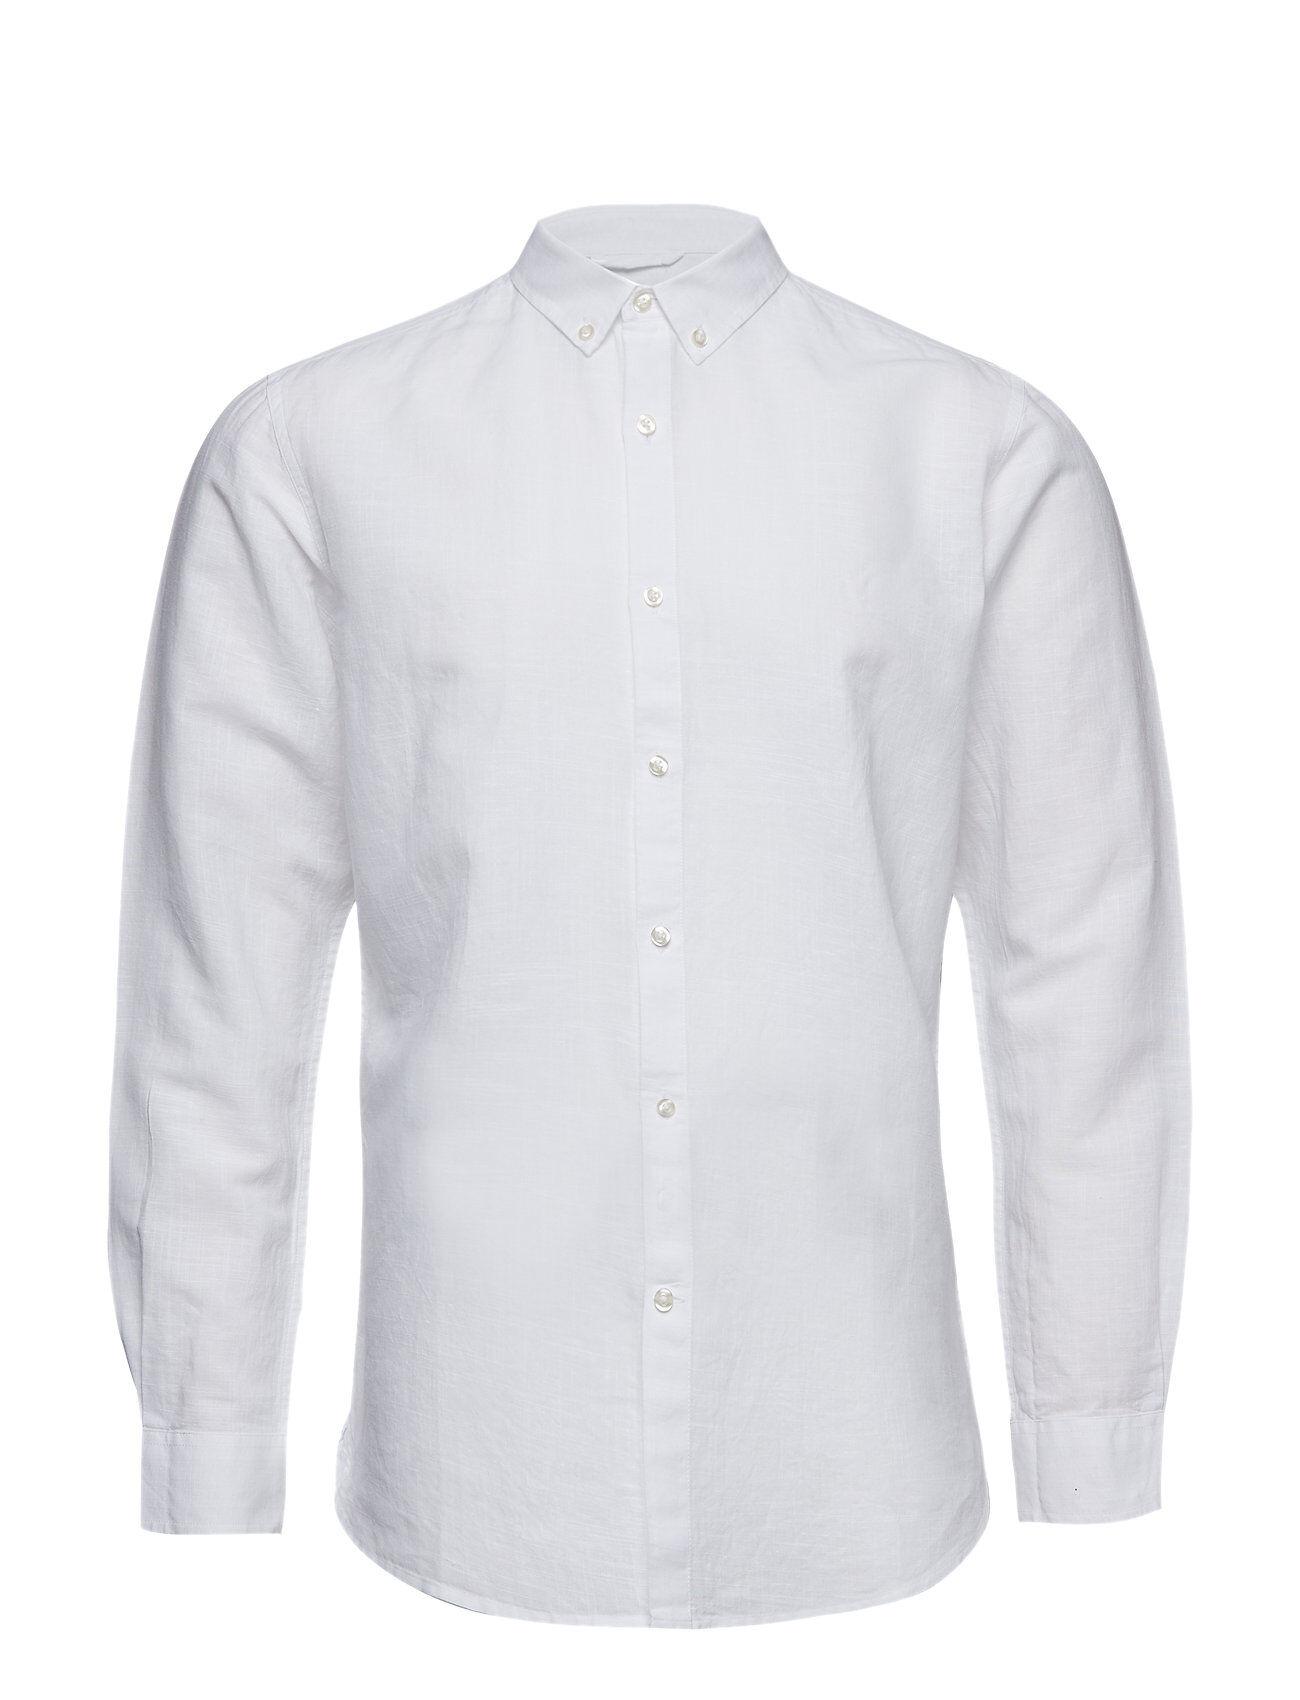 Knowledge Cotton Apparel Cotton Linen Long Sleeved Shirt - G